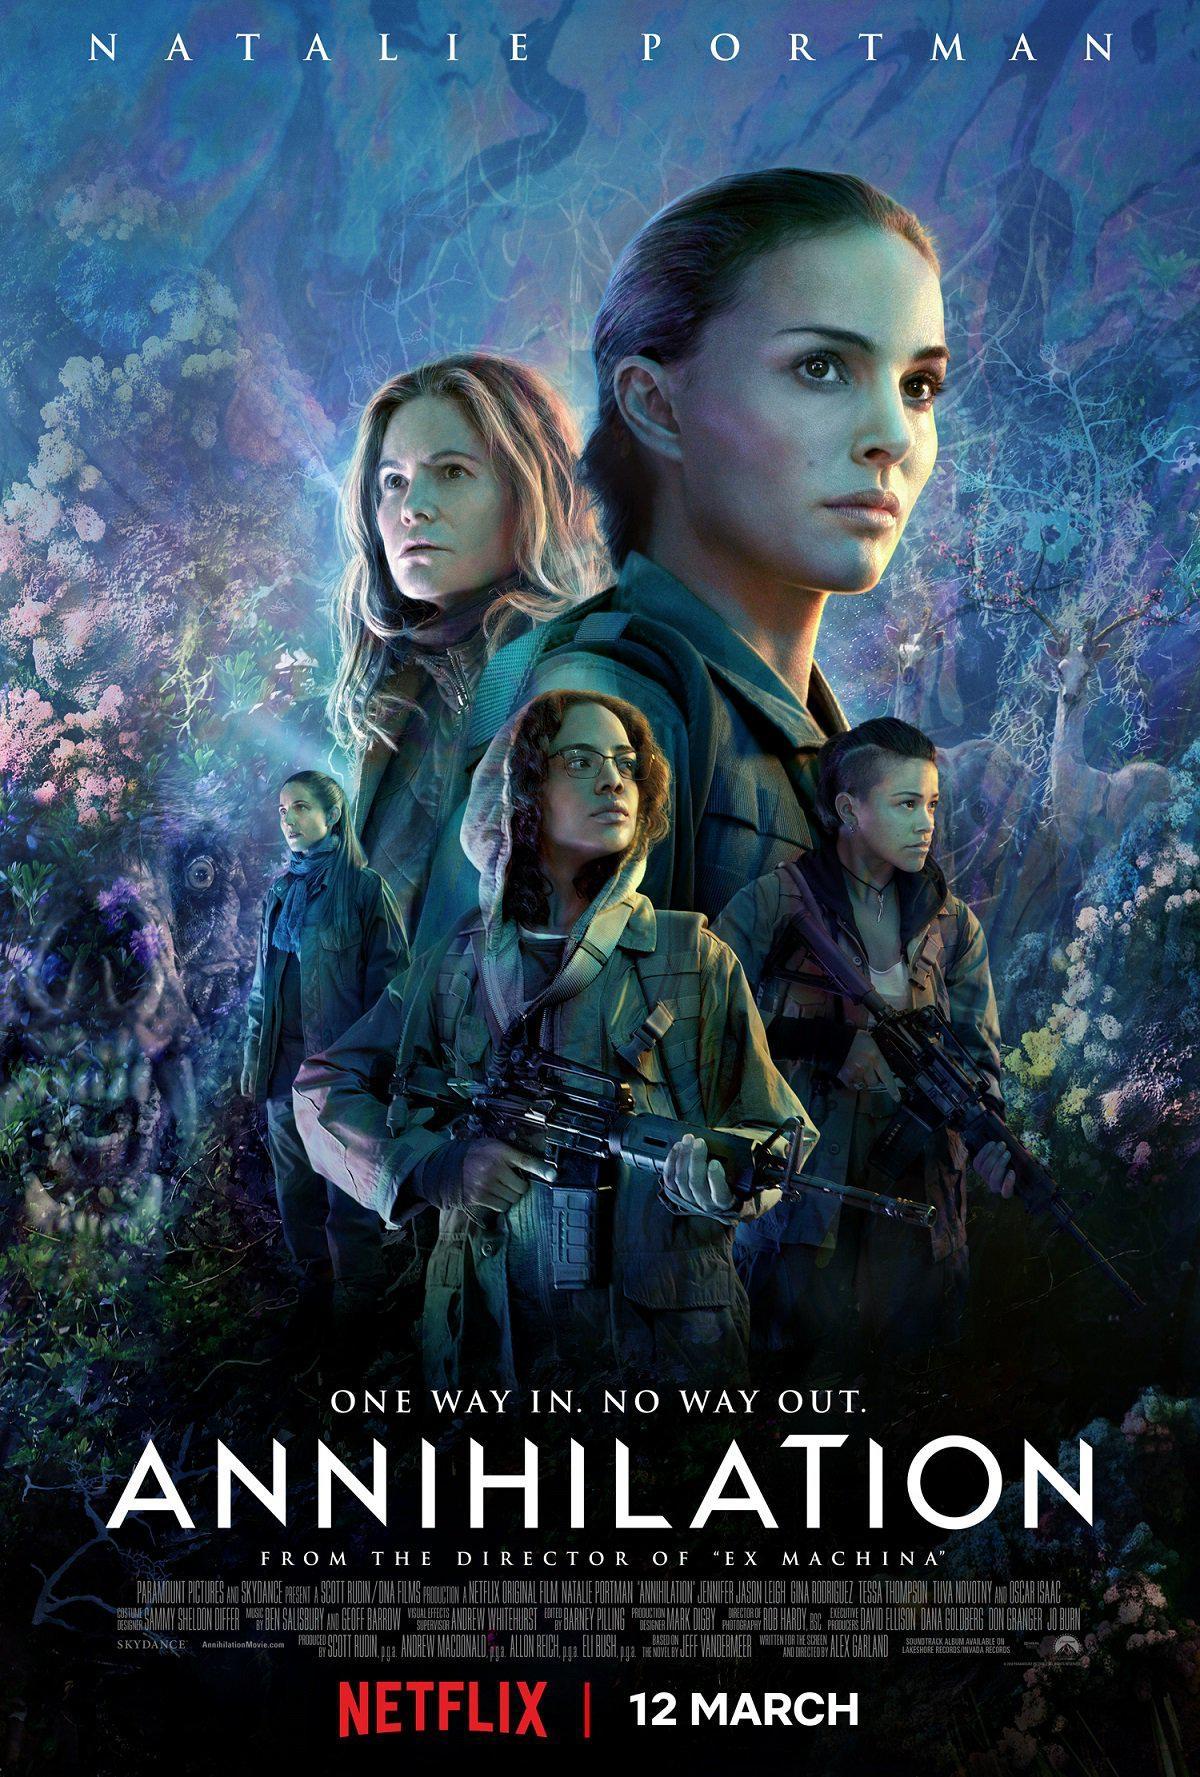 film, cinéma, netflix, annhilation, sga, Jeff VanderMeer , thriller, horrifique, nathalie portman